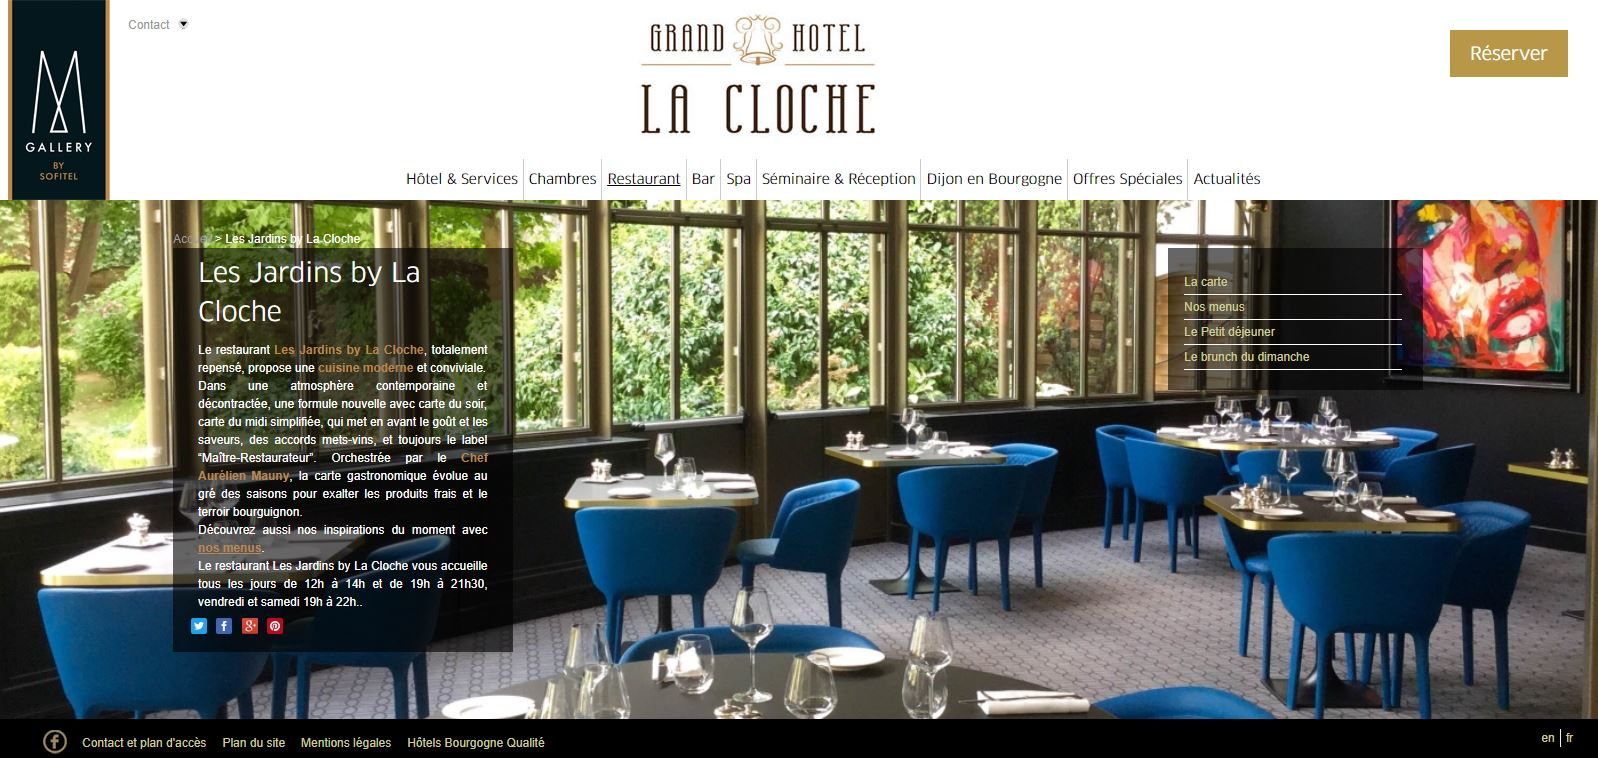 http://www.hotel-lacloche.fr/les-jardins-la-cloche